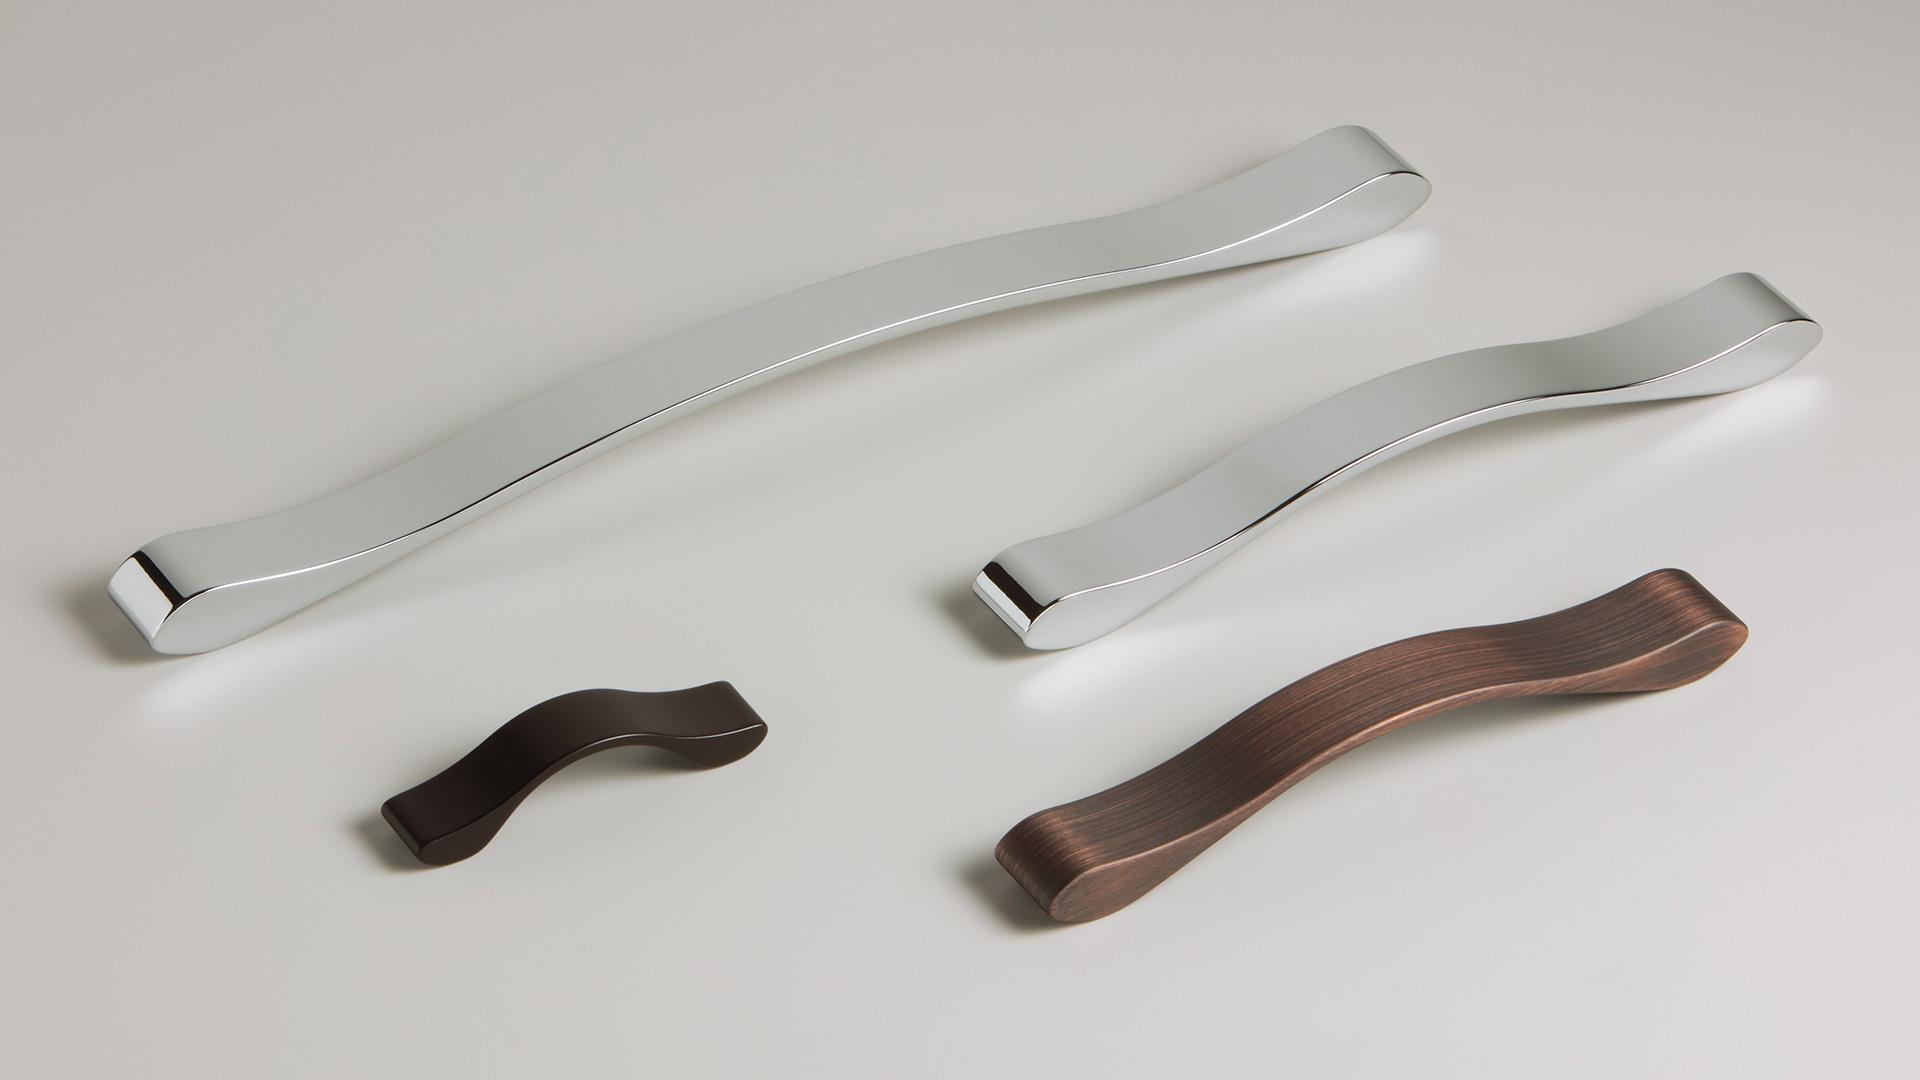 022_CITTERIOGIULIO_contemporary_handles.jpg